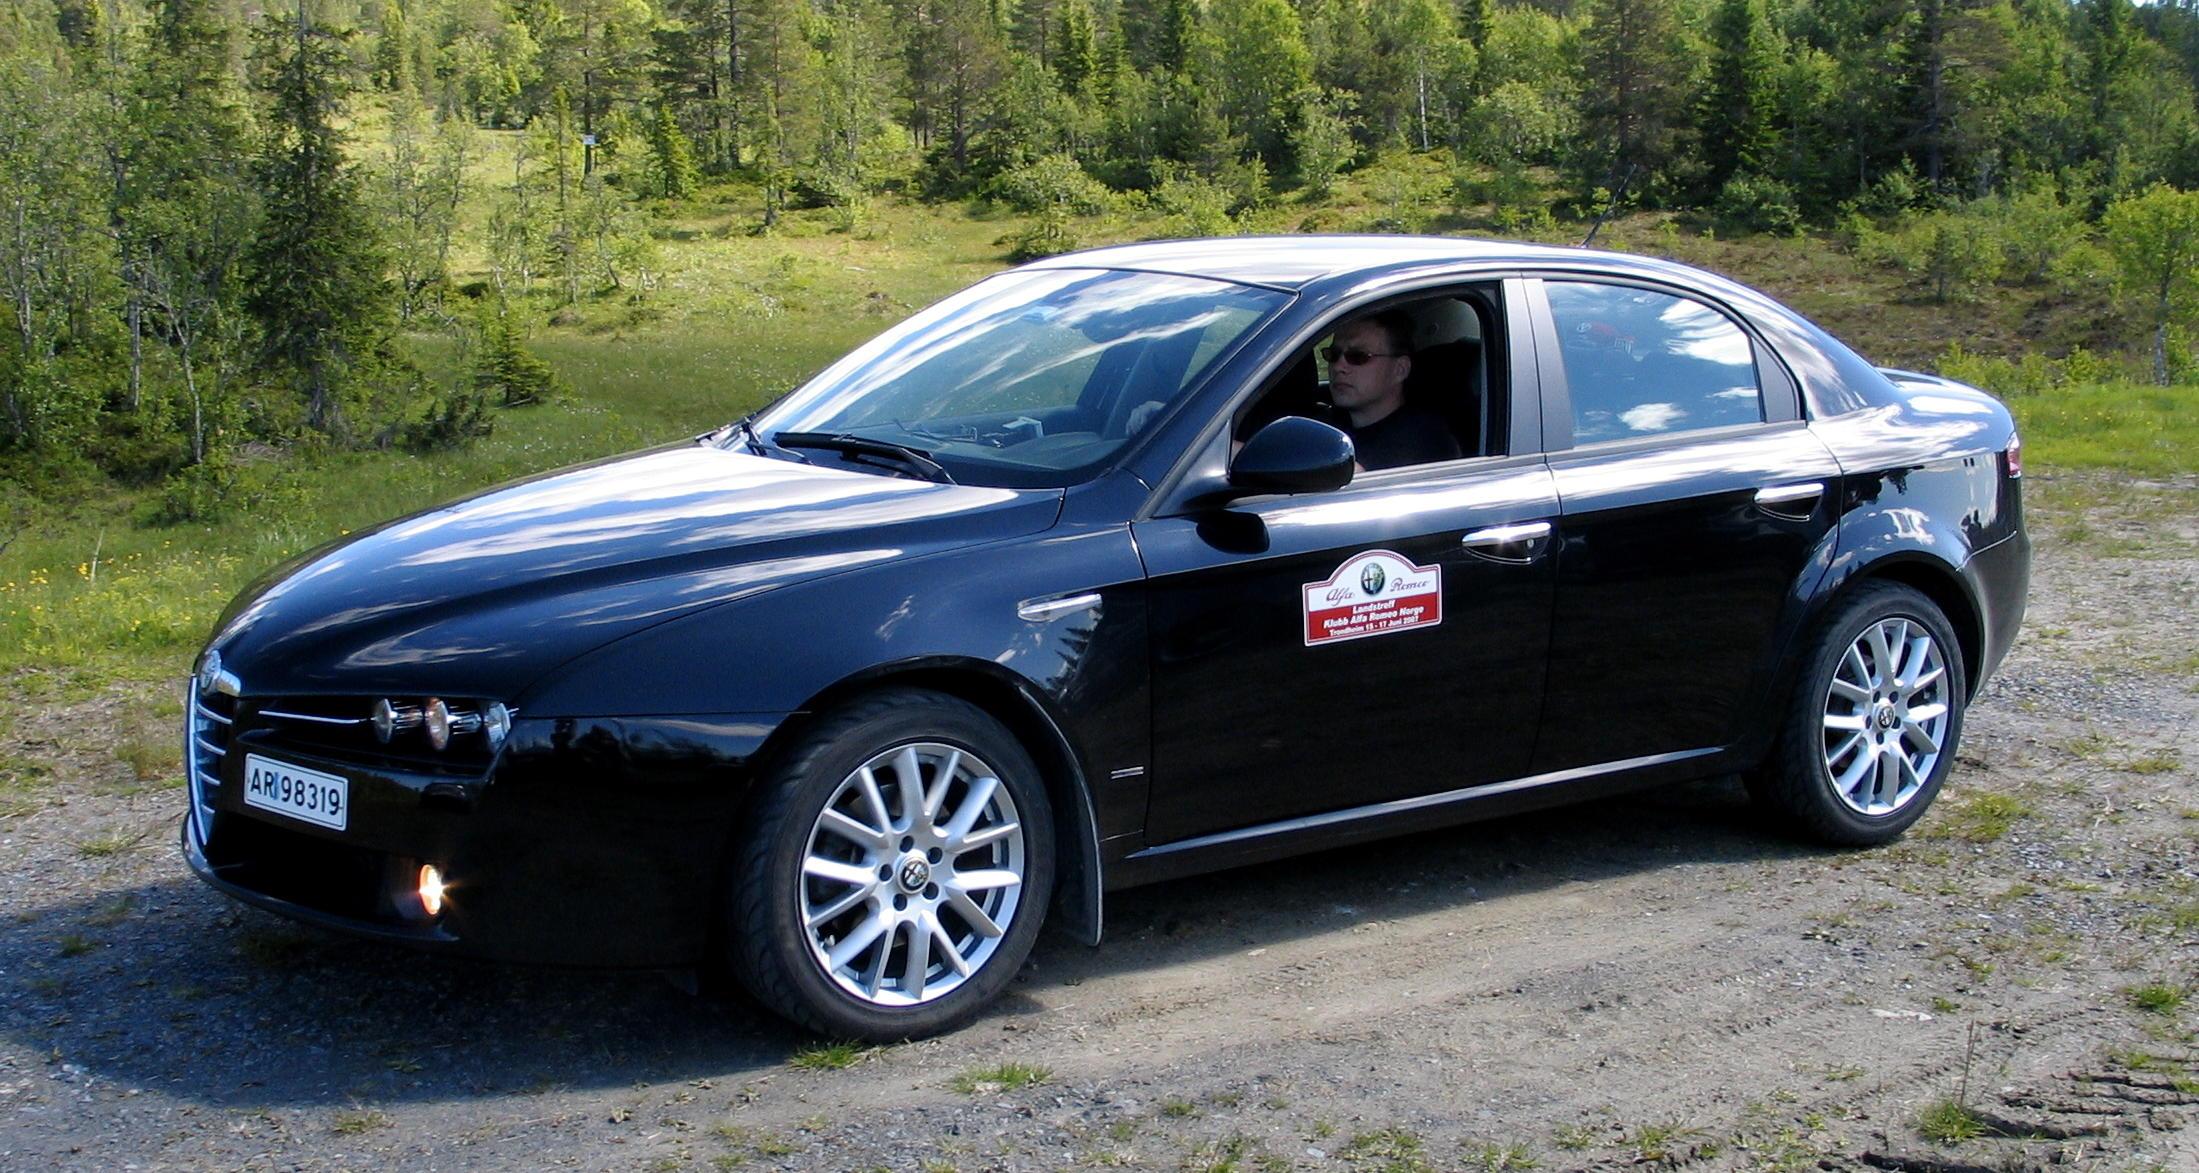 Topworldauto Photos Of Alfa Romeo 159 Photo Galleries